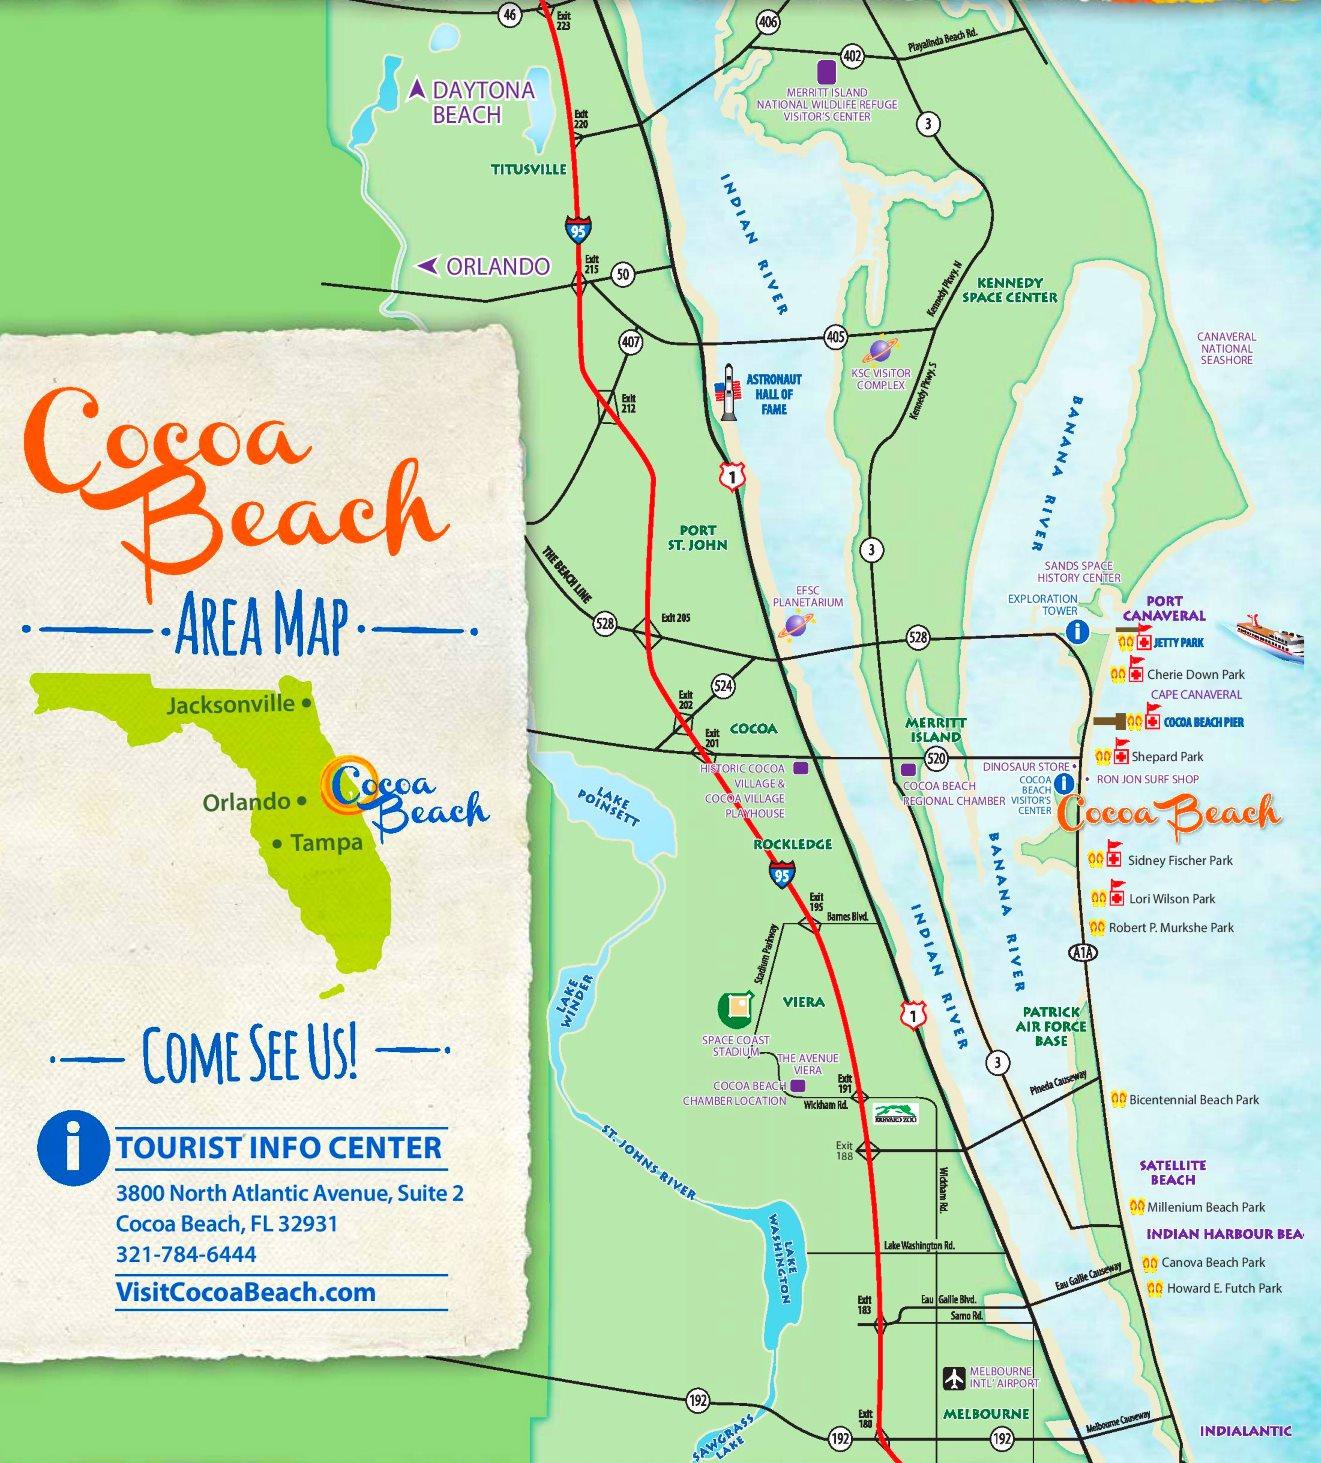 Cocoa Beach Tourist Map - Inlet Beach Florida Map